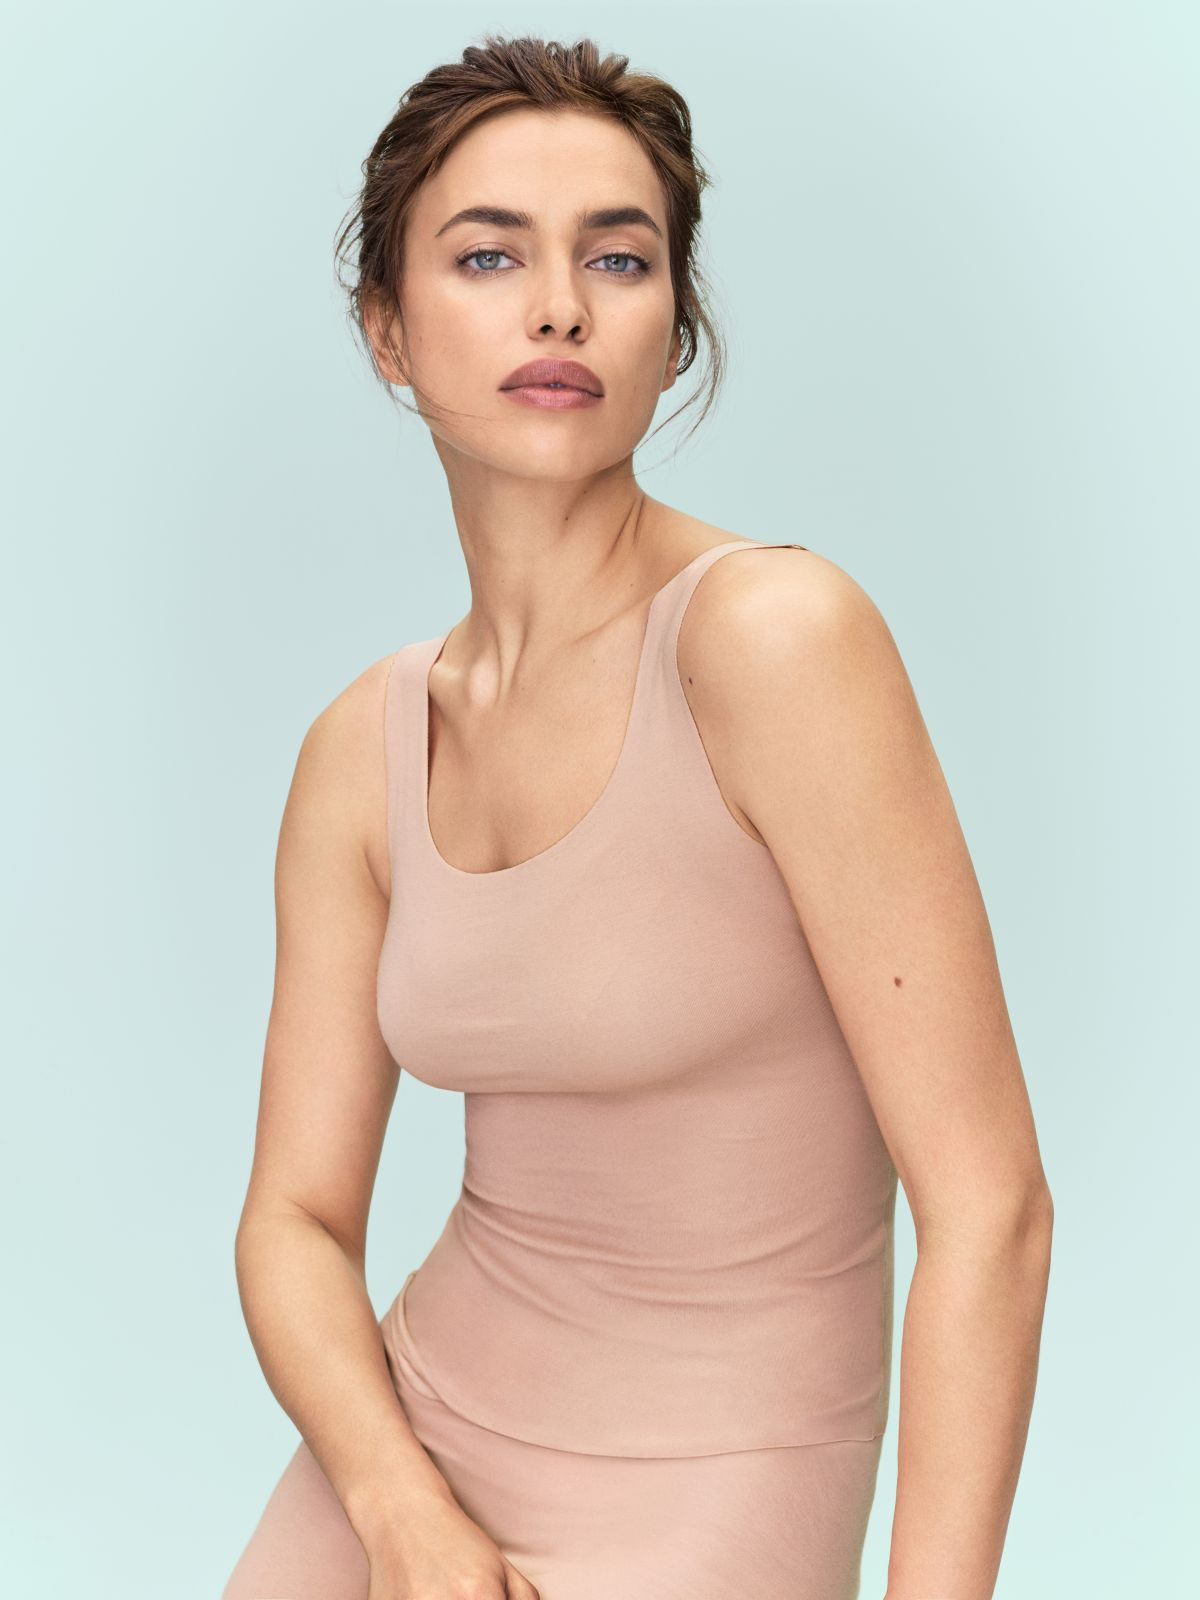 Irina Shayk gets into silk designs for Intimissimi Campaign